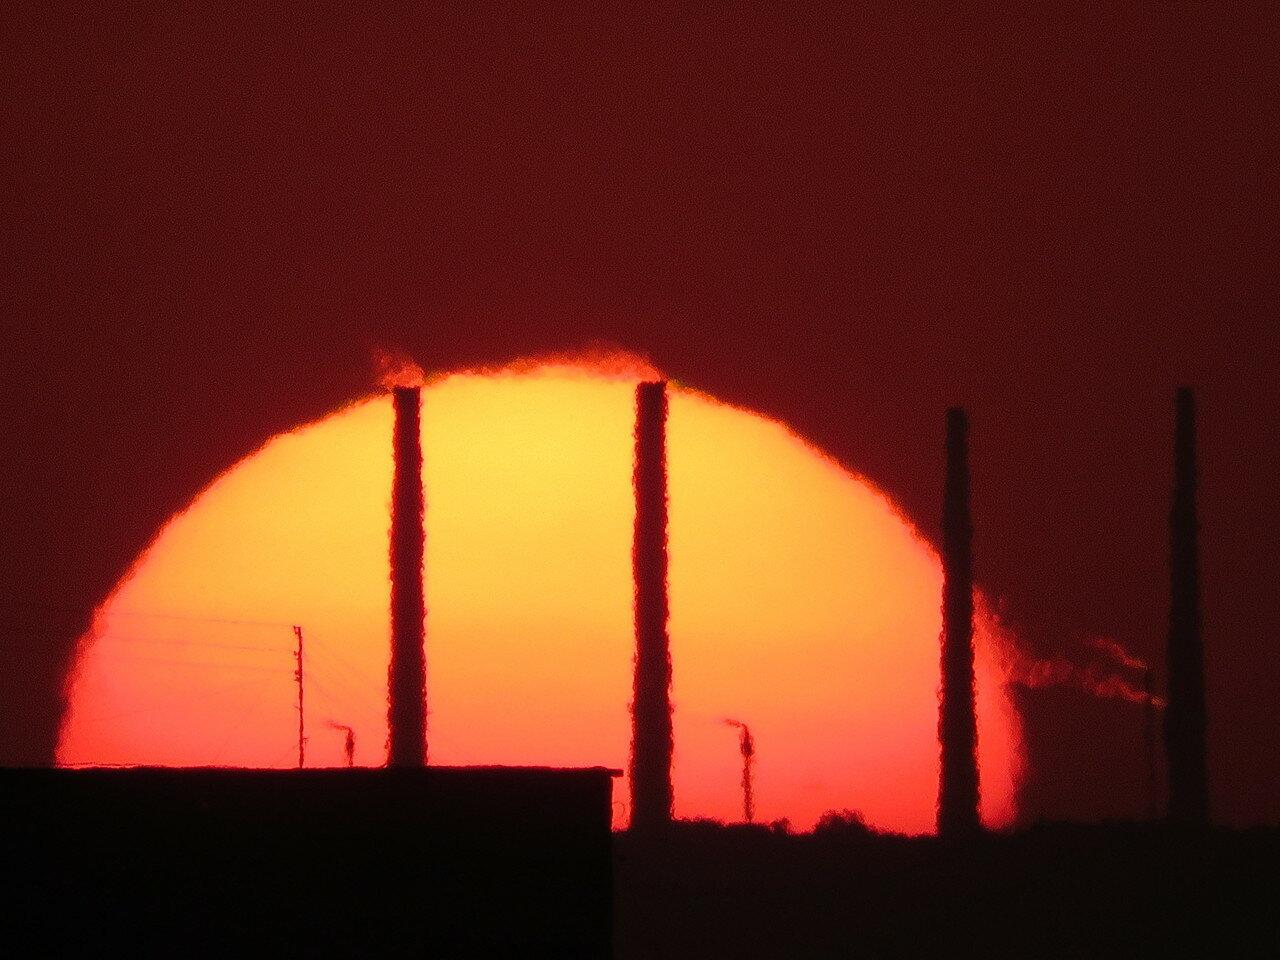 Солнце Небо вспыхнет огнём.jpg